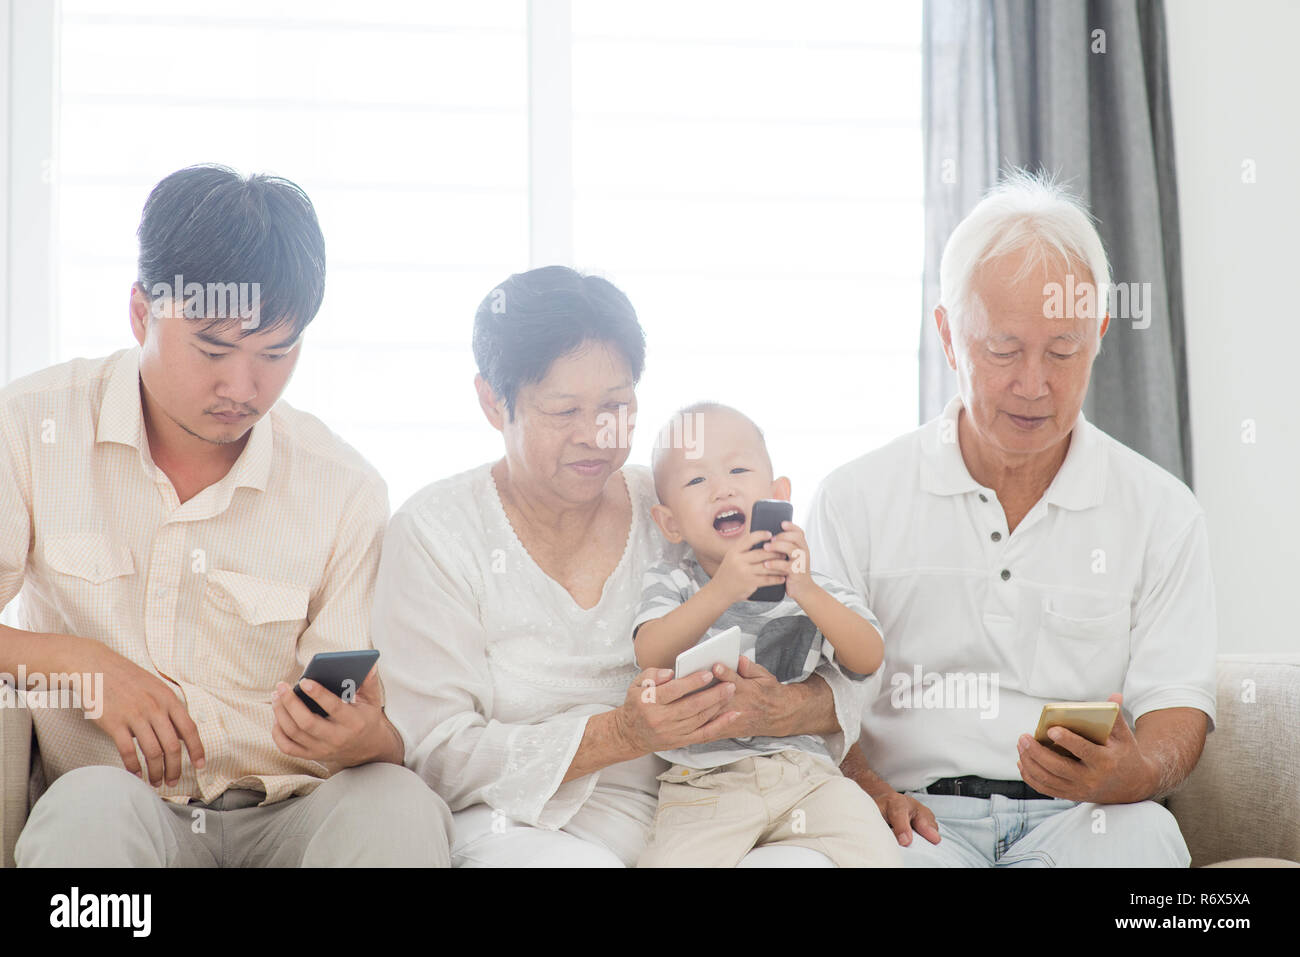 Smartphone addicted family - Stock Image